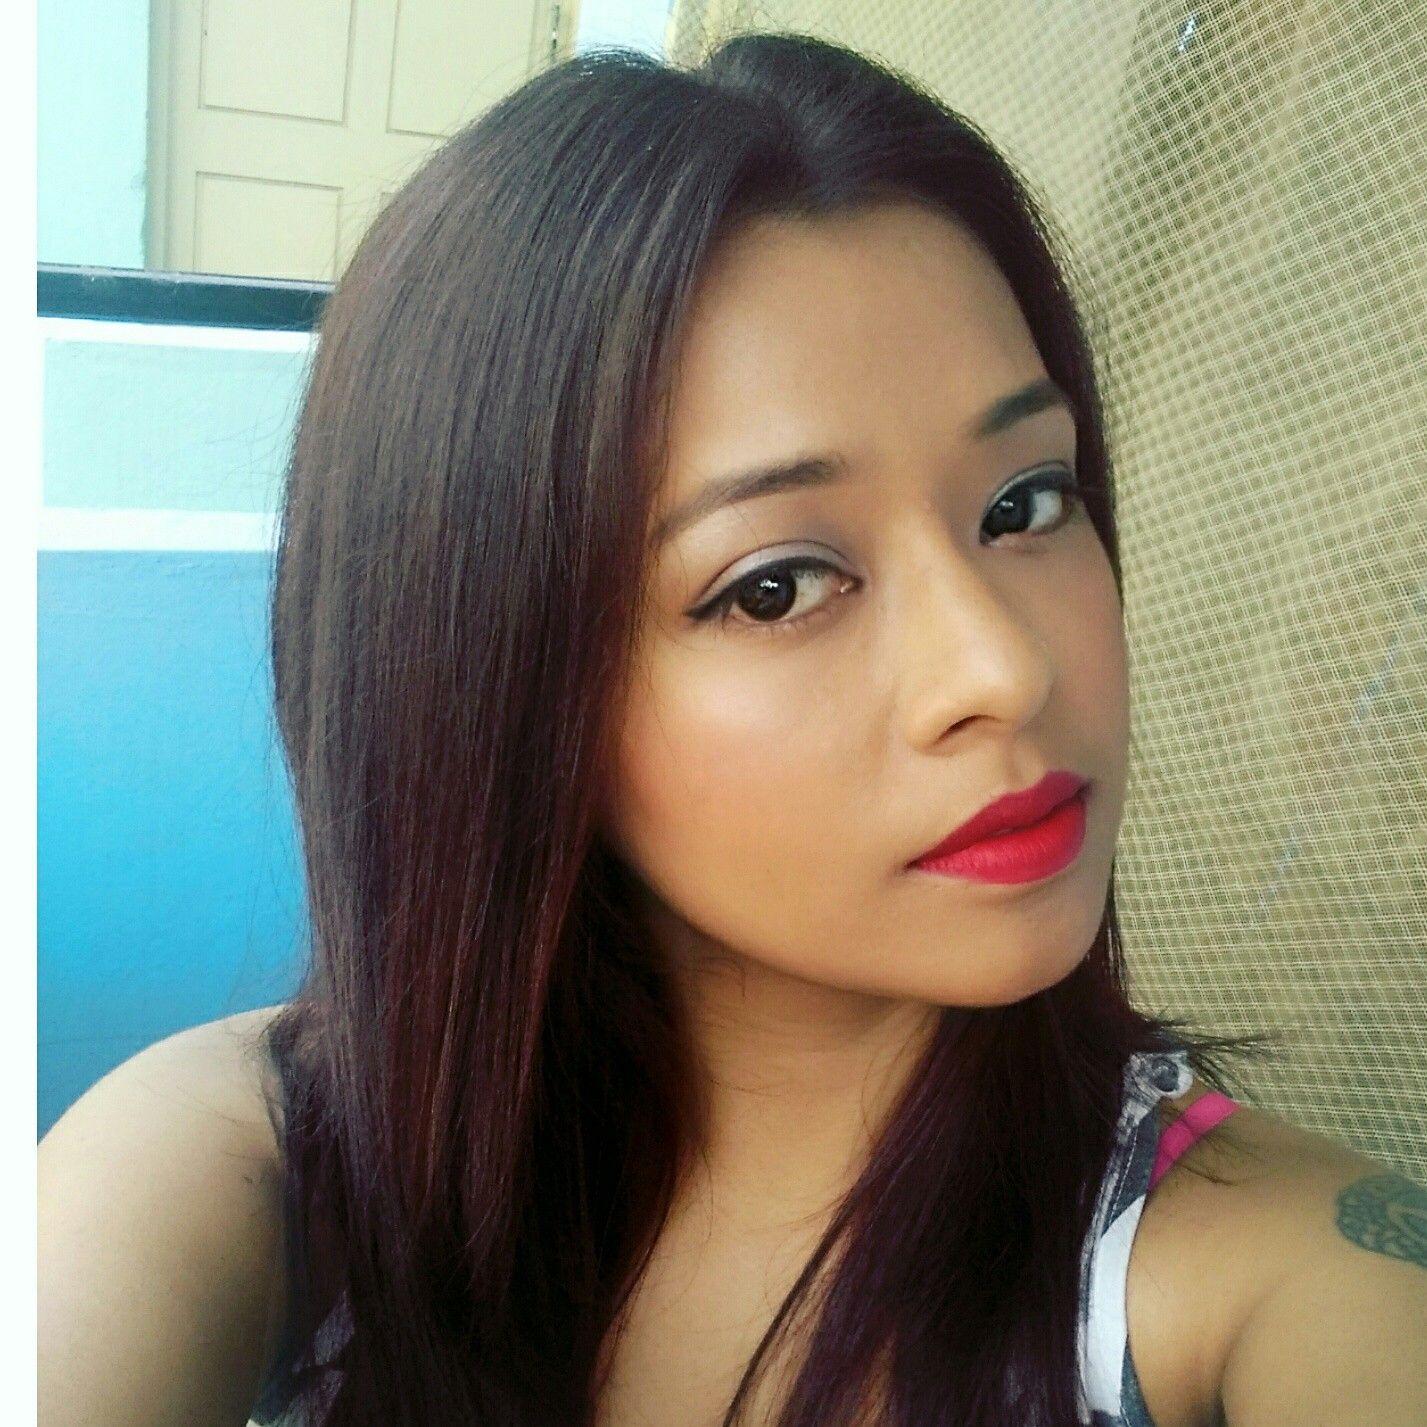 #wingtip #makeuplove #fashionblogger #bangalorefashionblogger #indianfashionblogger #skullsandtulles #redlips #maccosmetics #macrubywoo #maclipstick